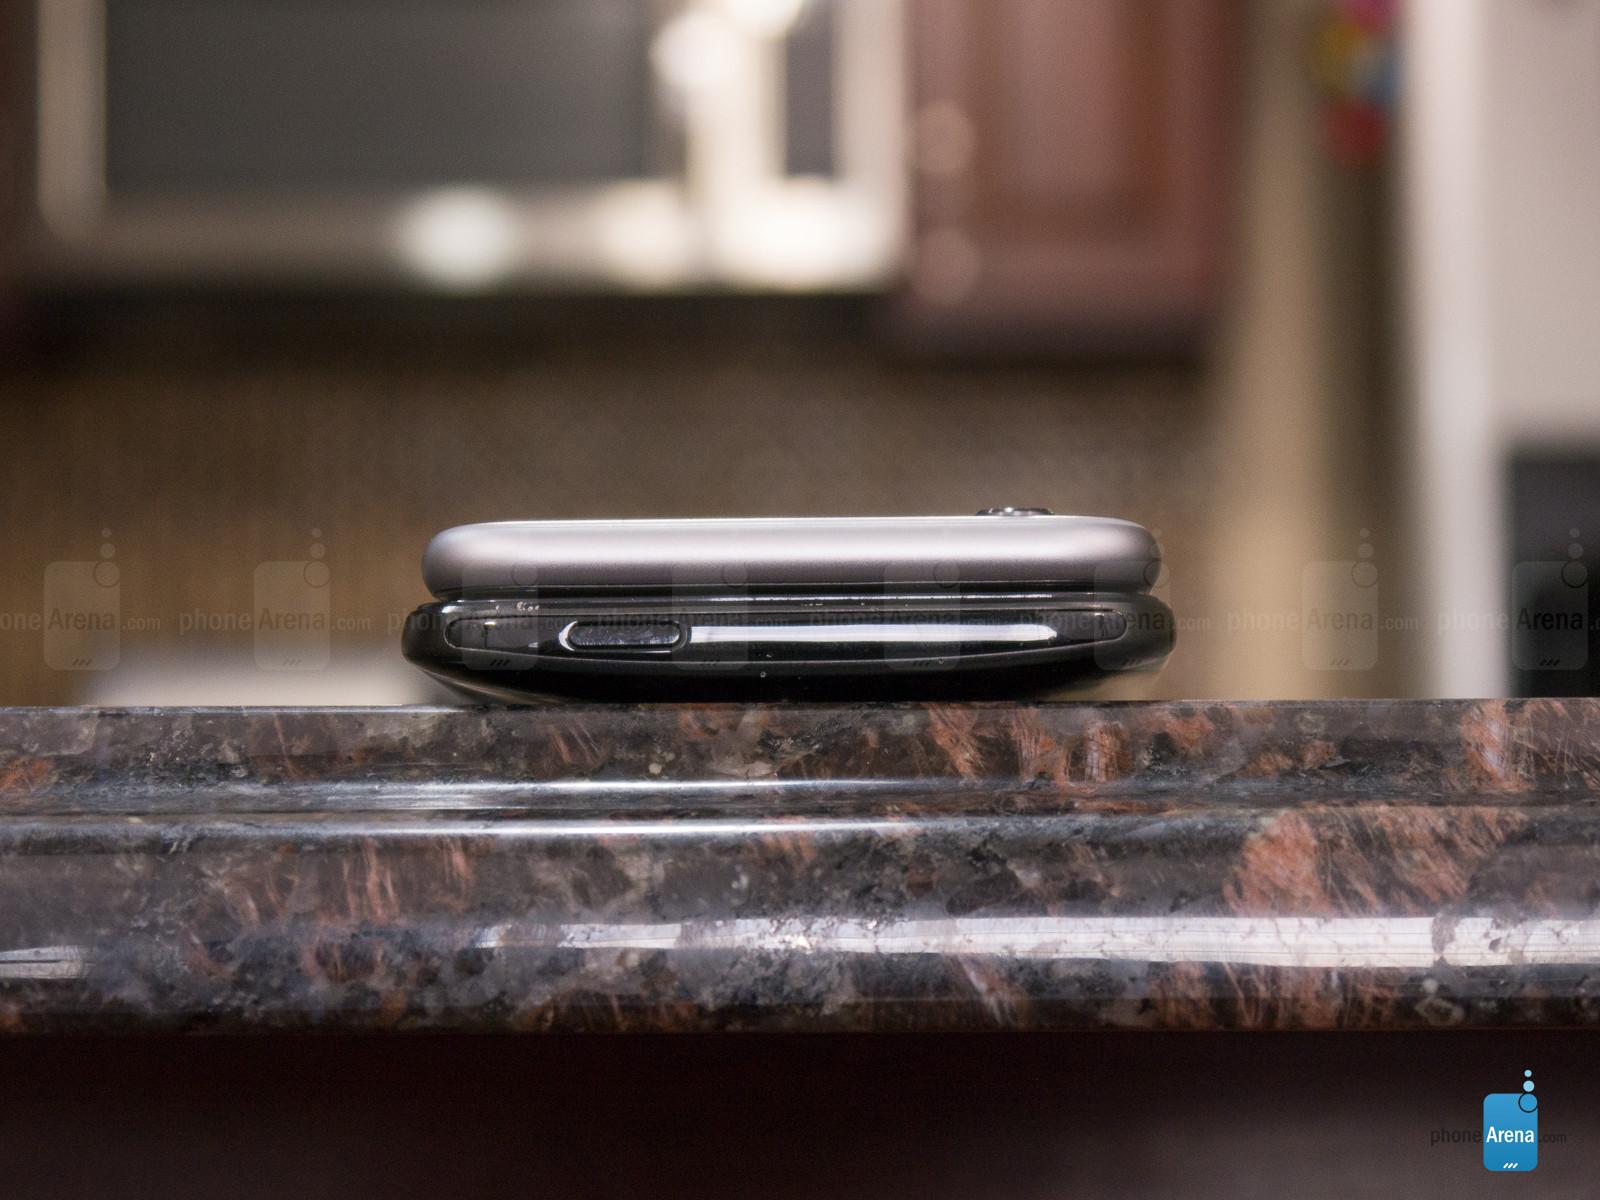 1422701078_iphone-6-versus-htc-one-m8-harmankardon-edition-11.jpg